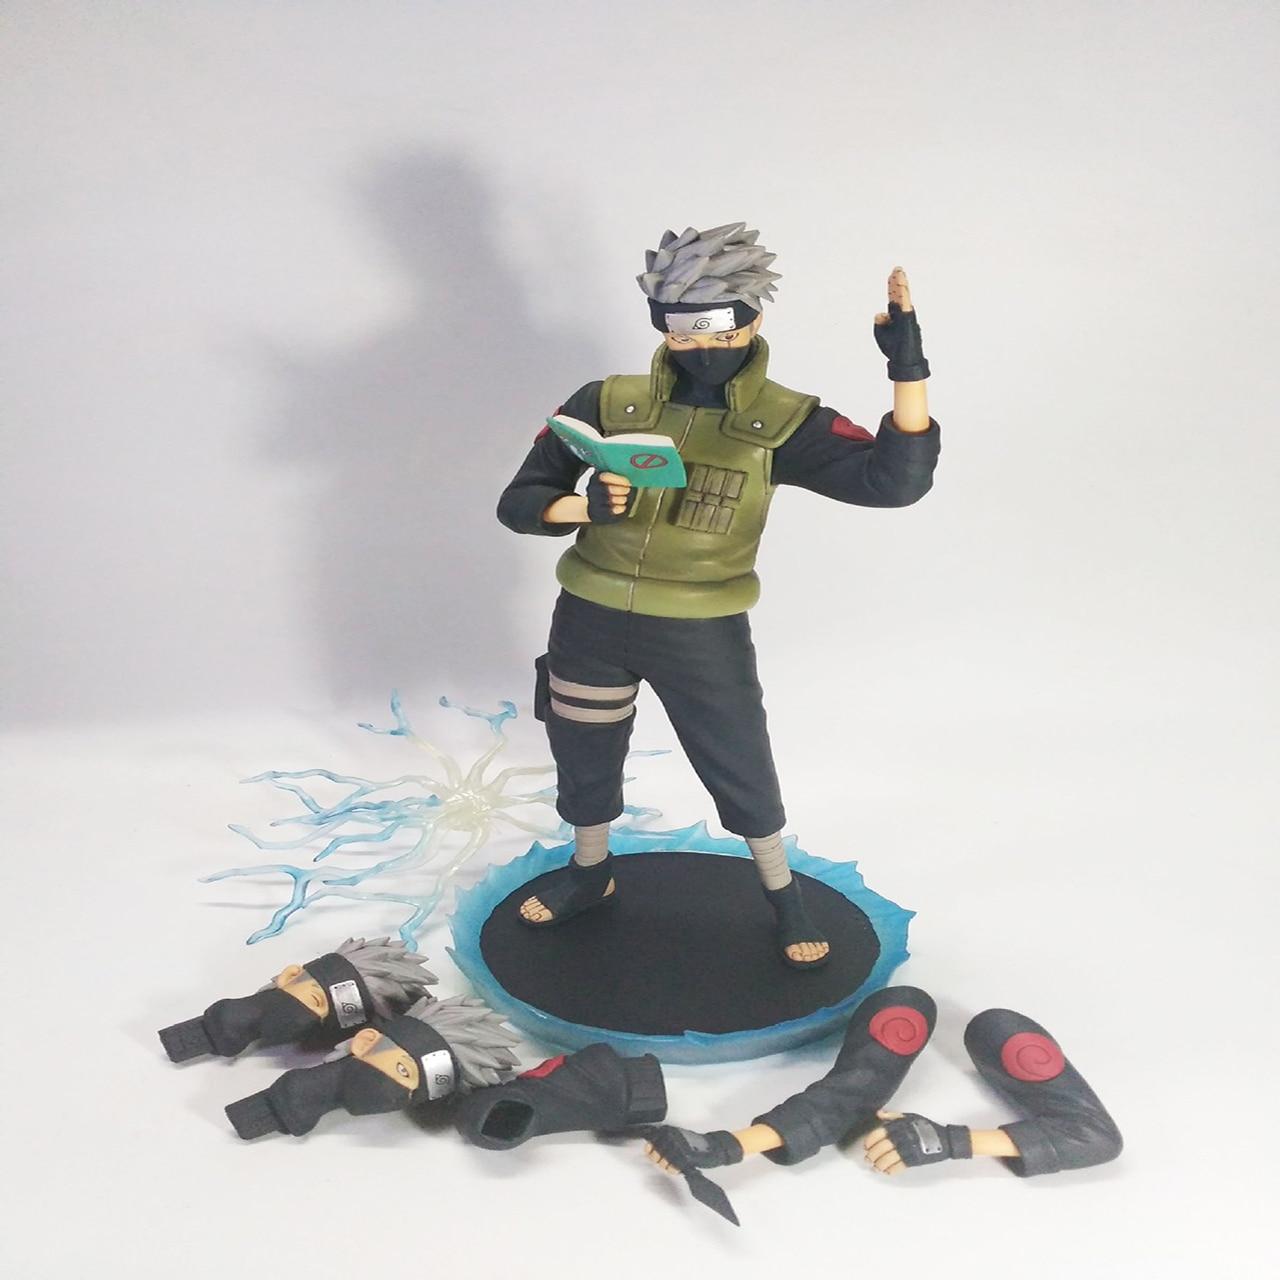 ФОТО Naruto Kakashi Hatake Action Figure Sharingan Ver. Kakashi Doll PVC Action Figure Collectible Model Toy 30cm KT3510